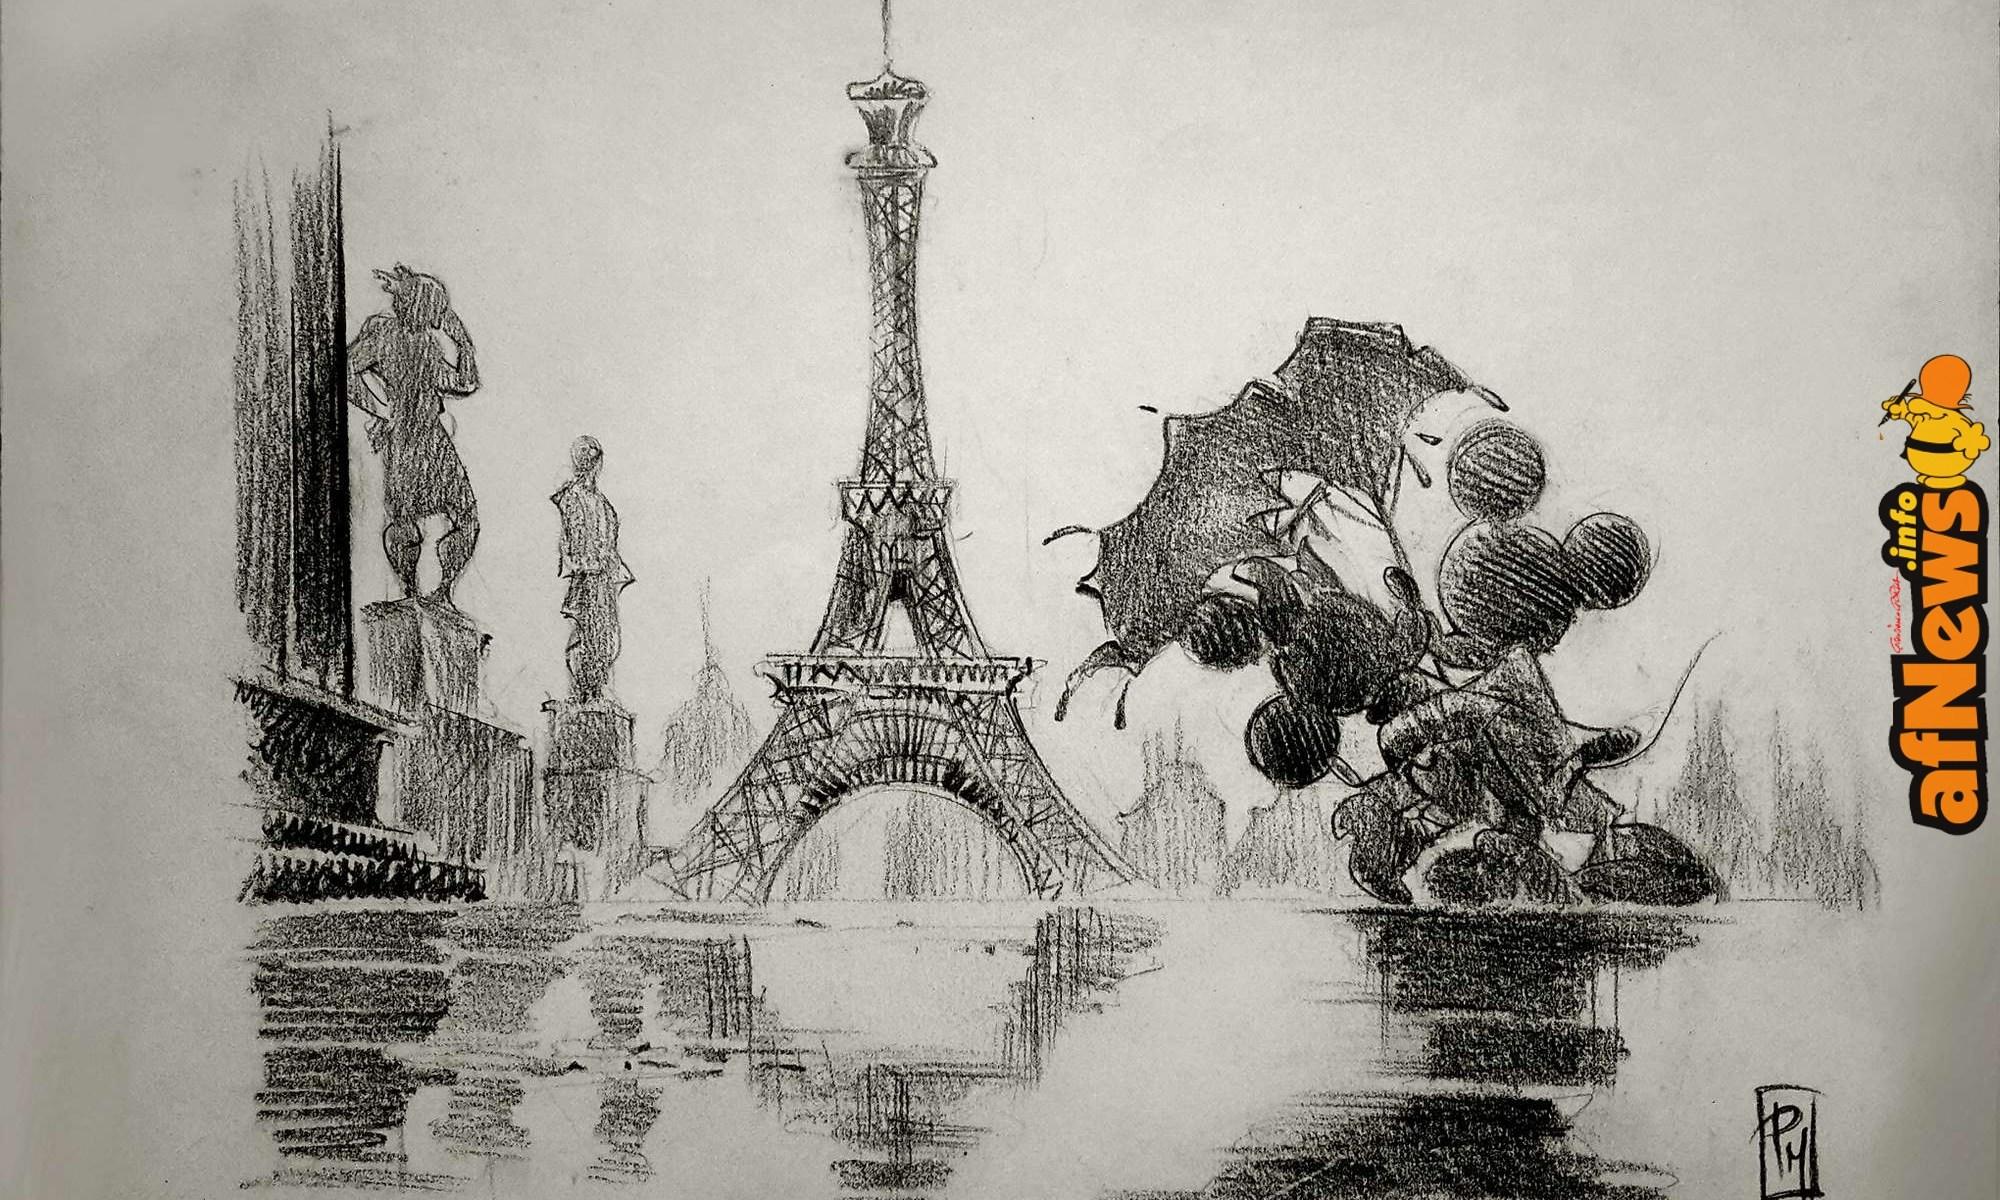 Paolo Mottura - Paris